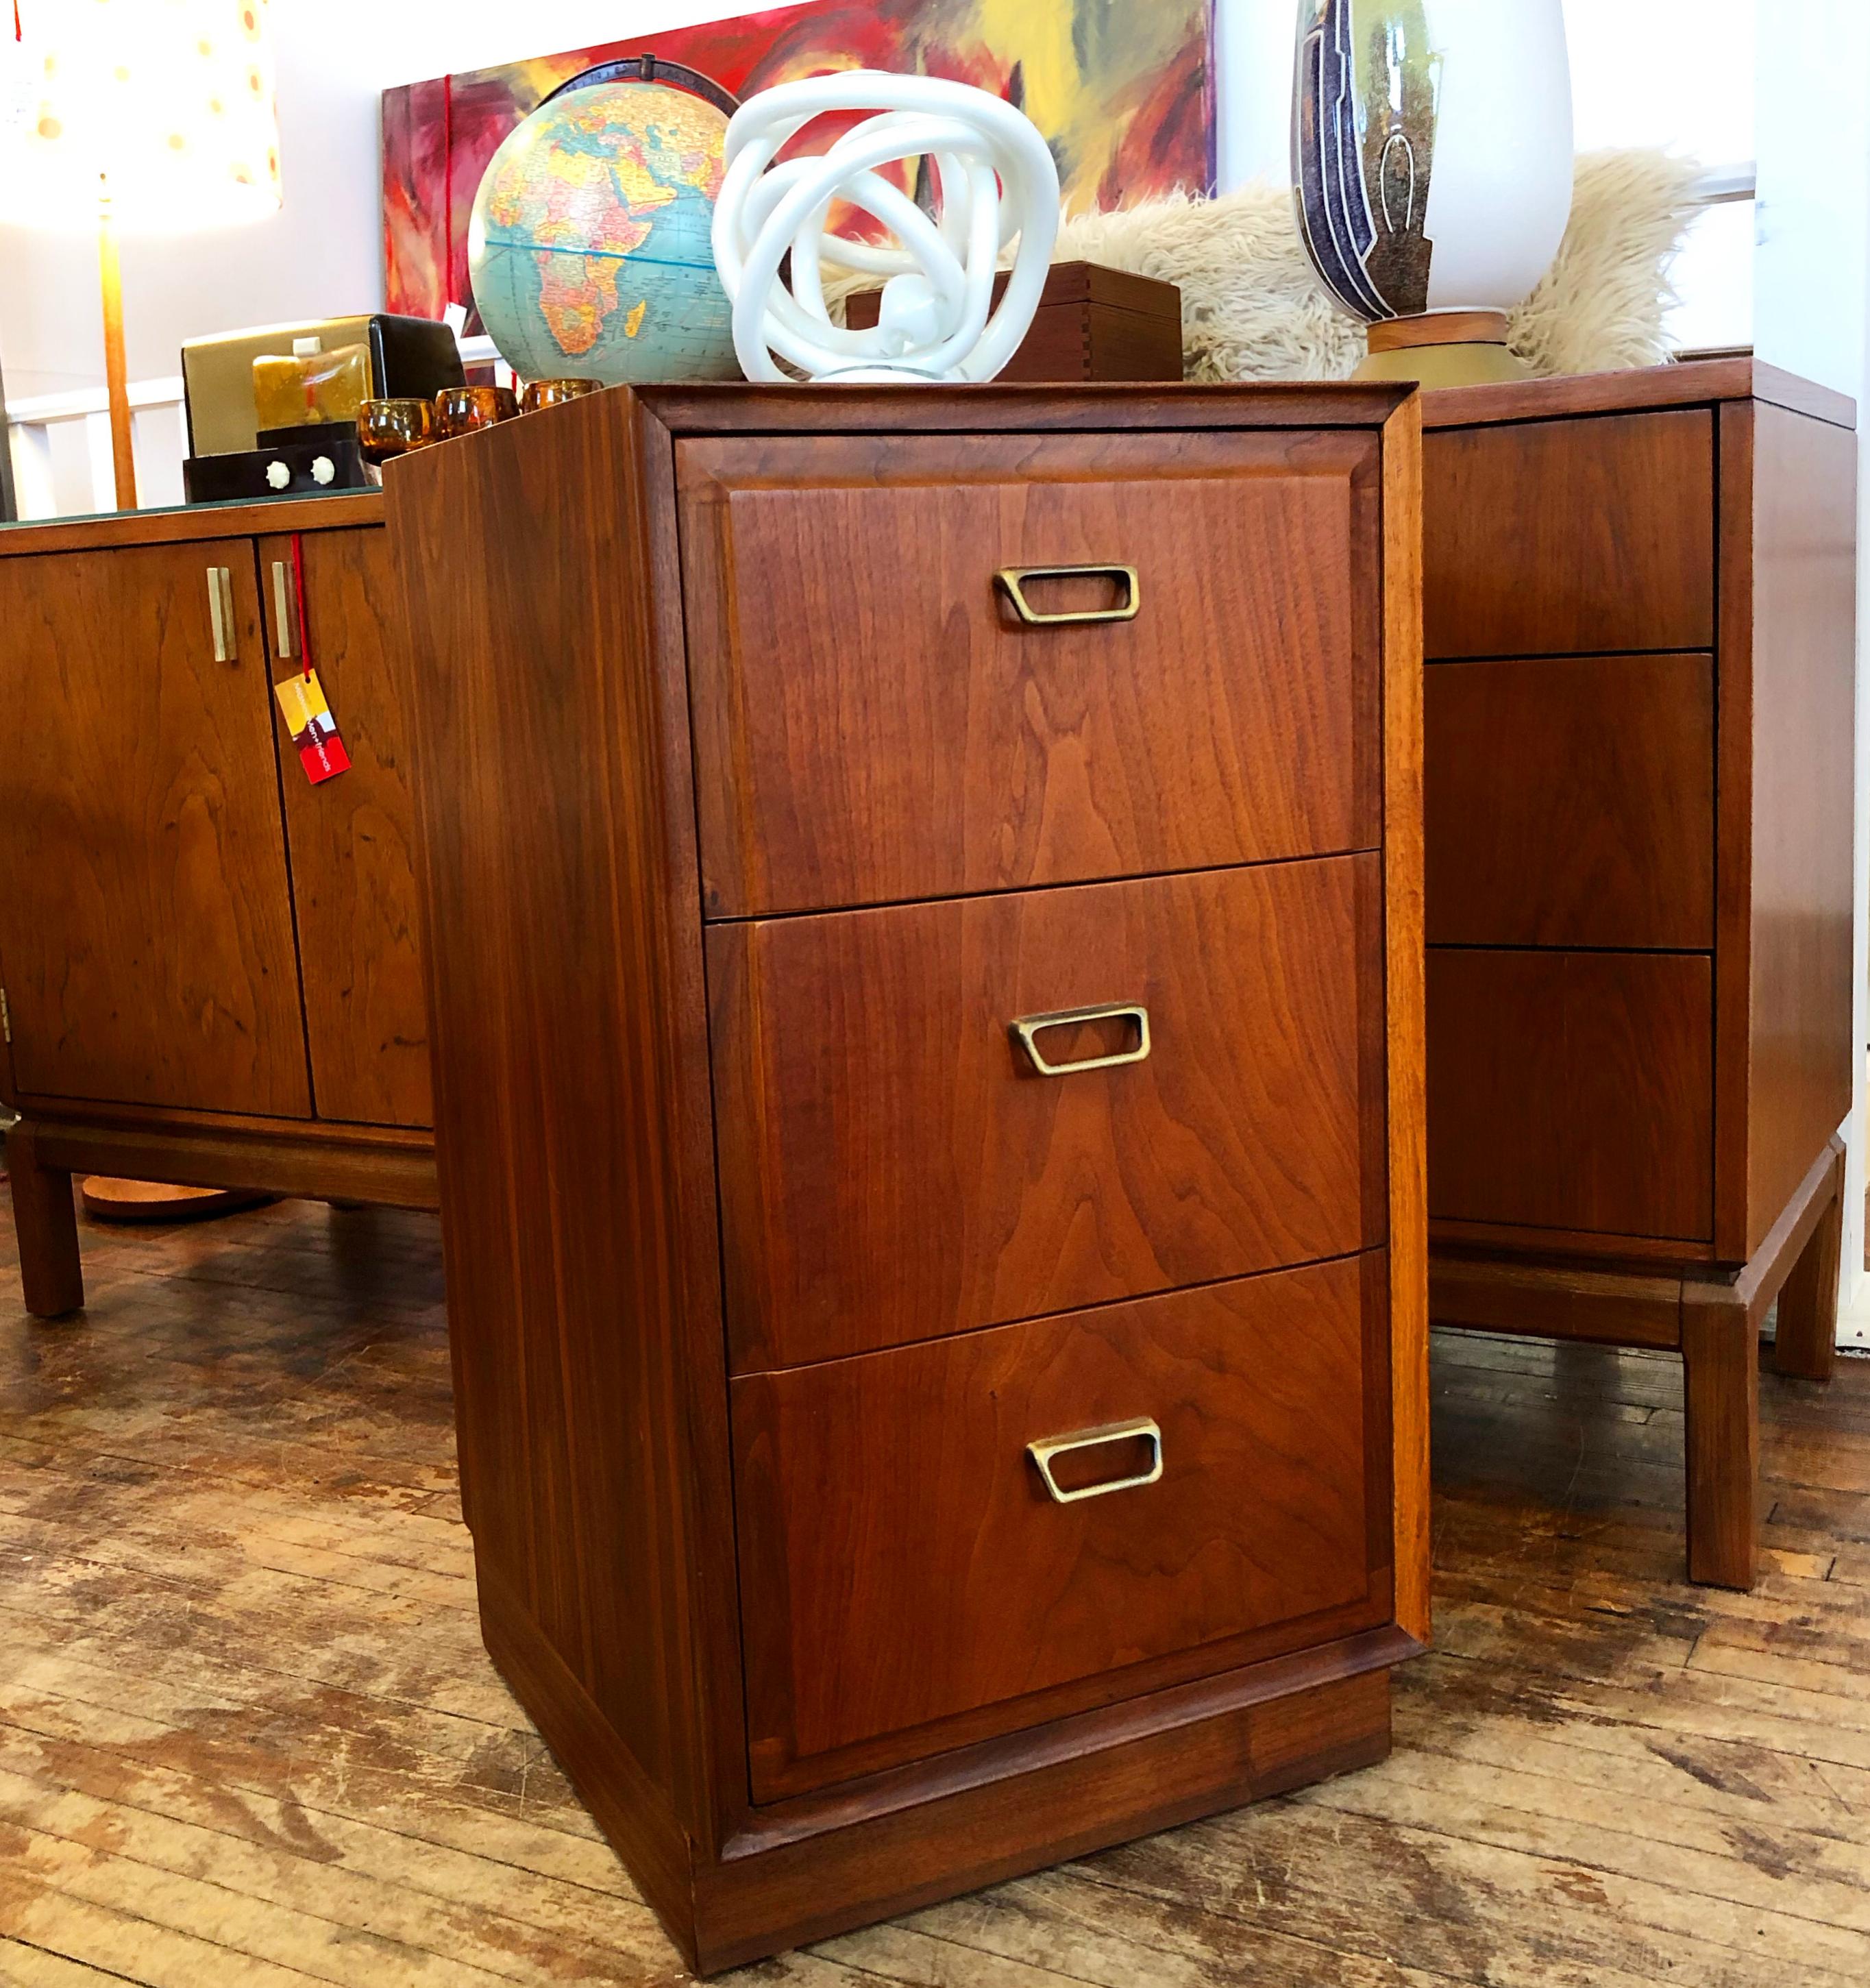 Founders Furniture 3-drawer walnut nightstand